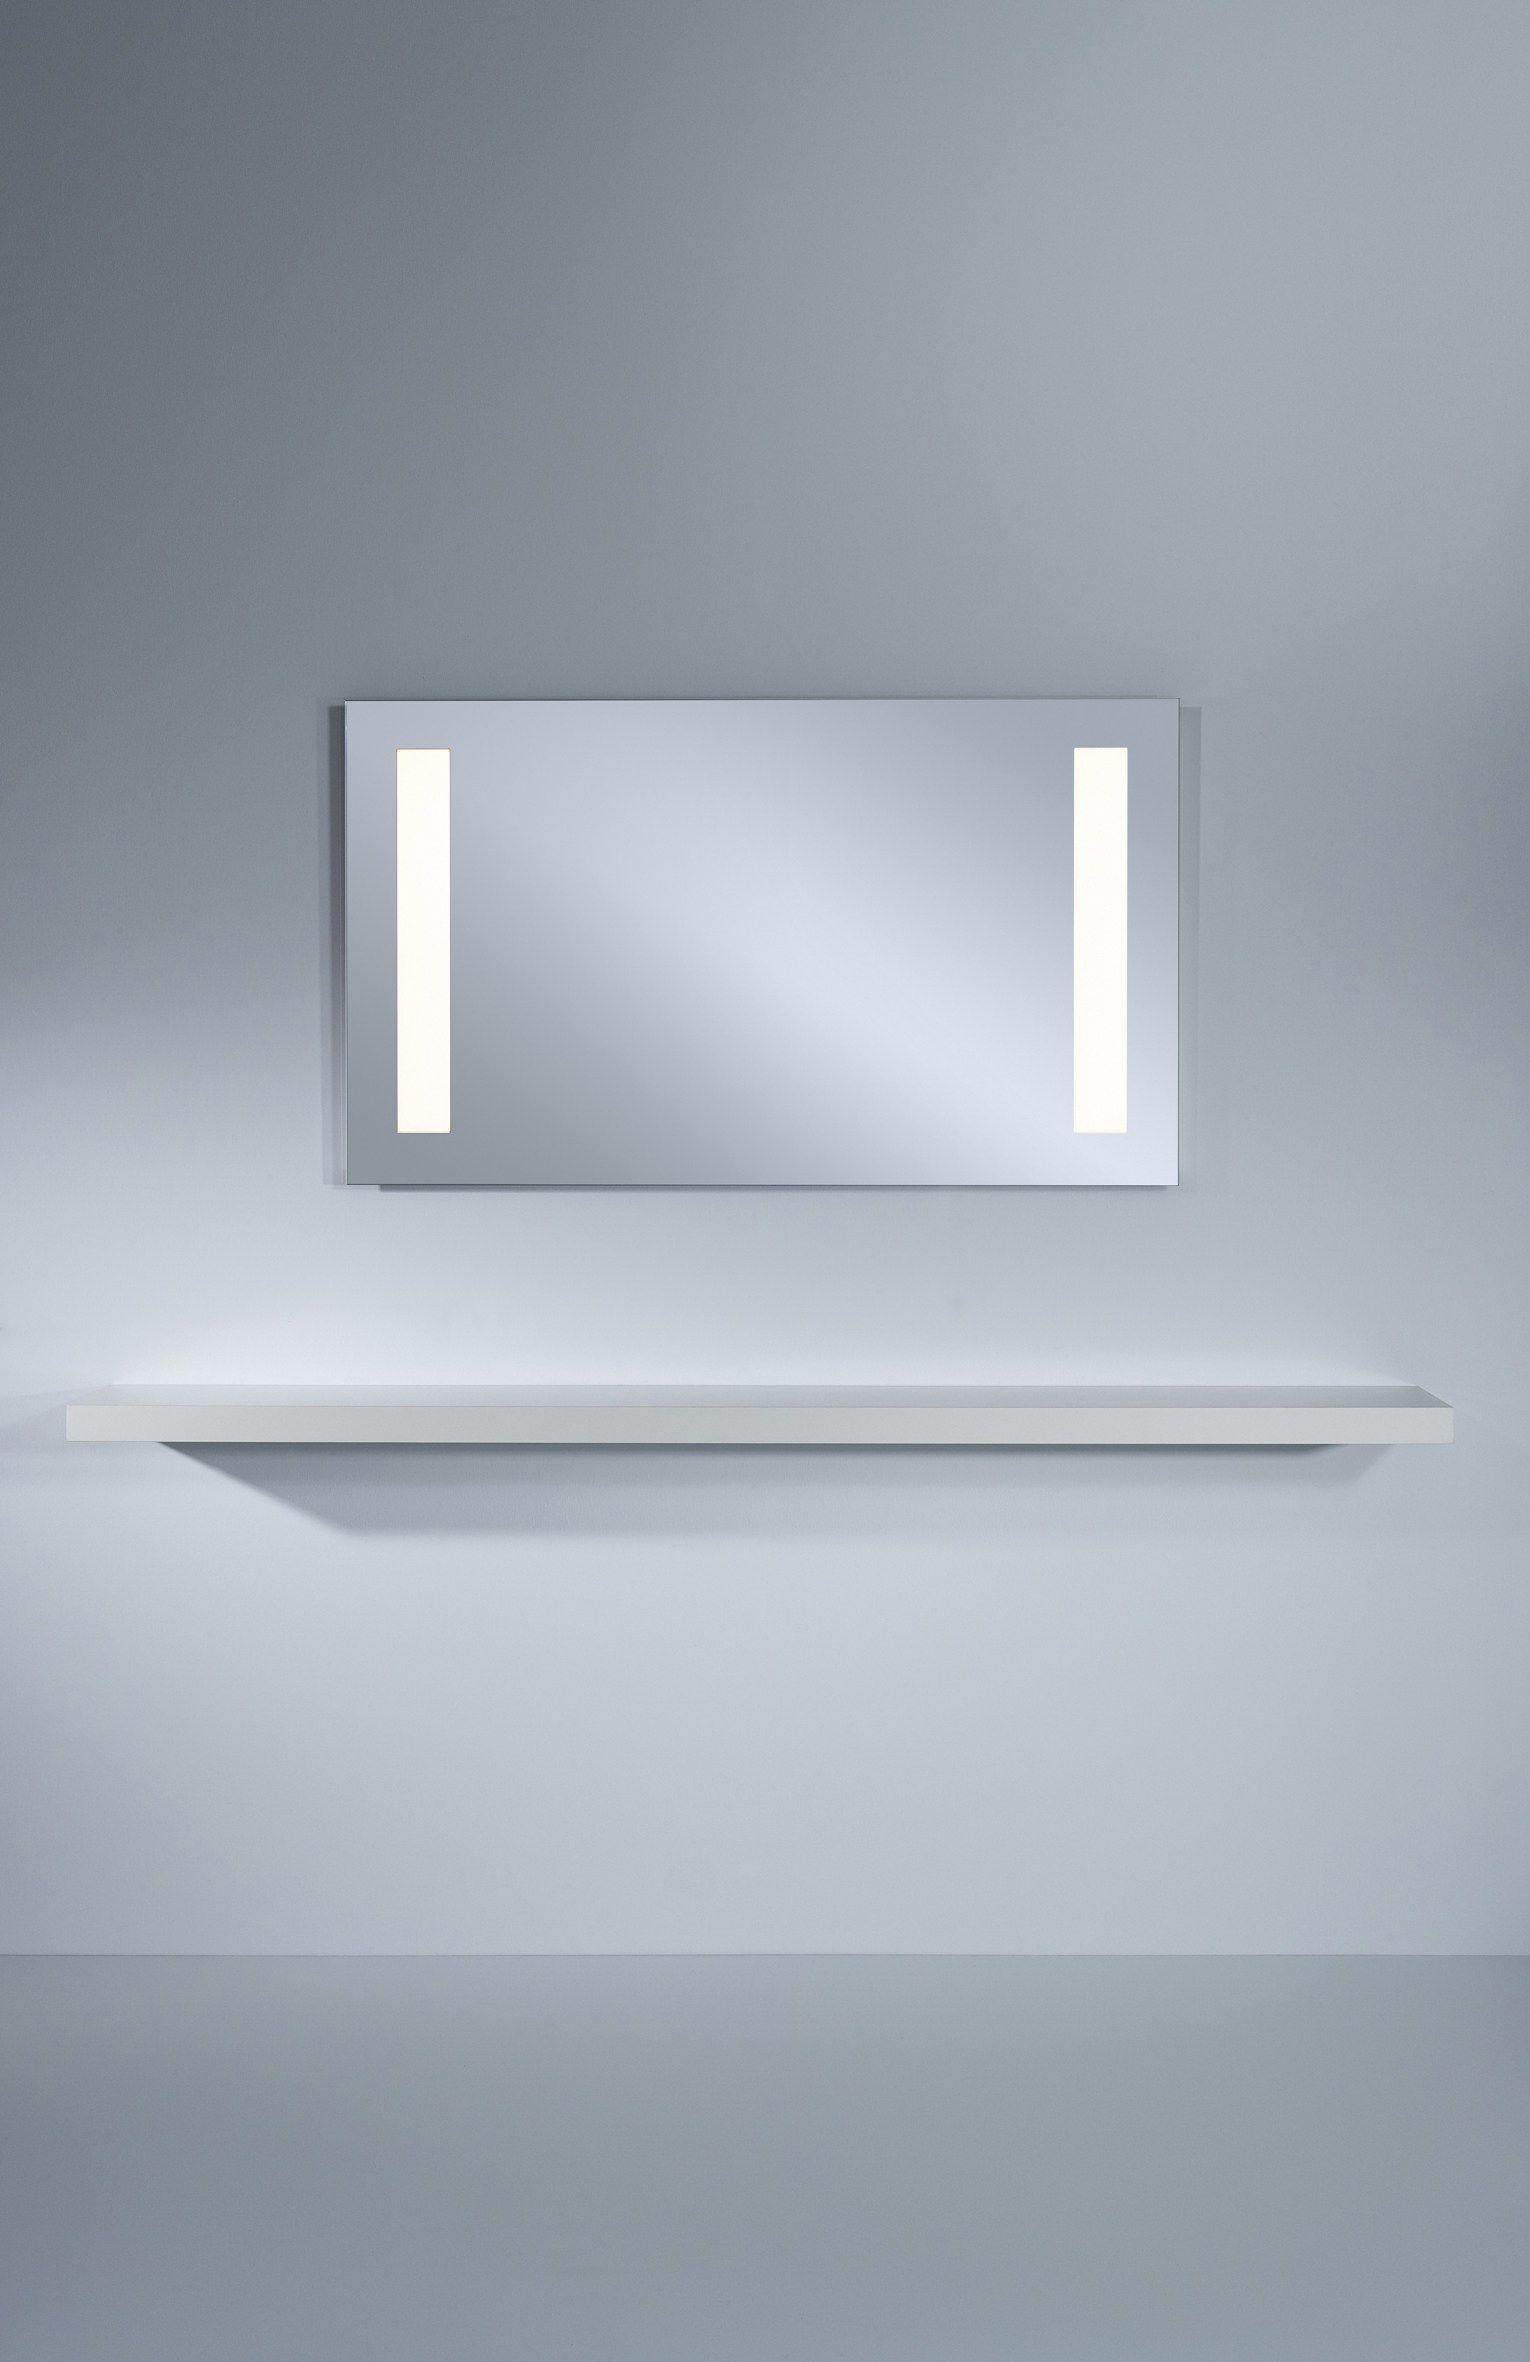 Miroir mural avec clairage int gr b pure by deknudt mirrors for Miroir mural